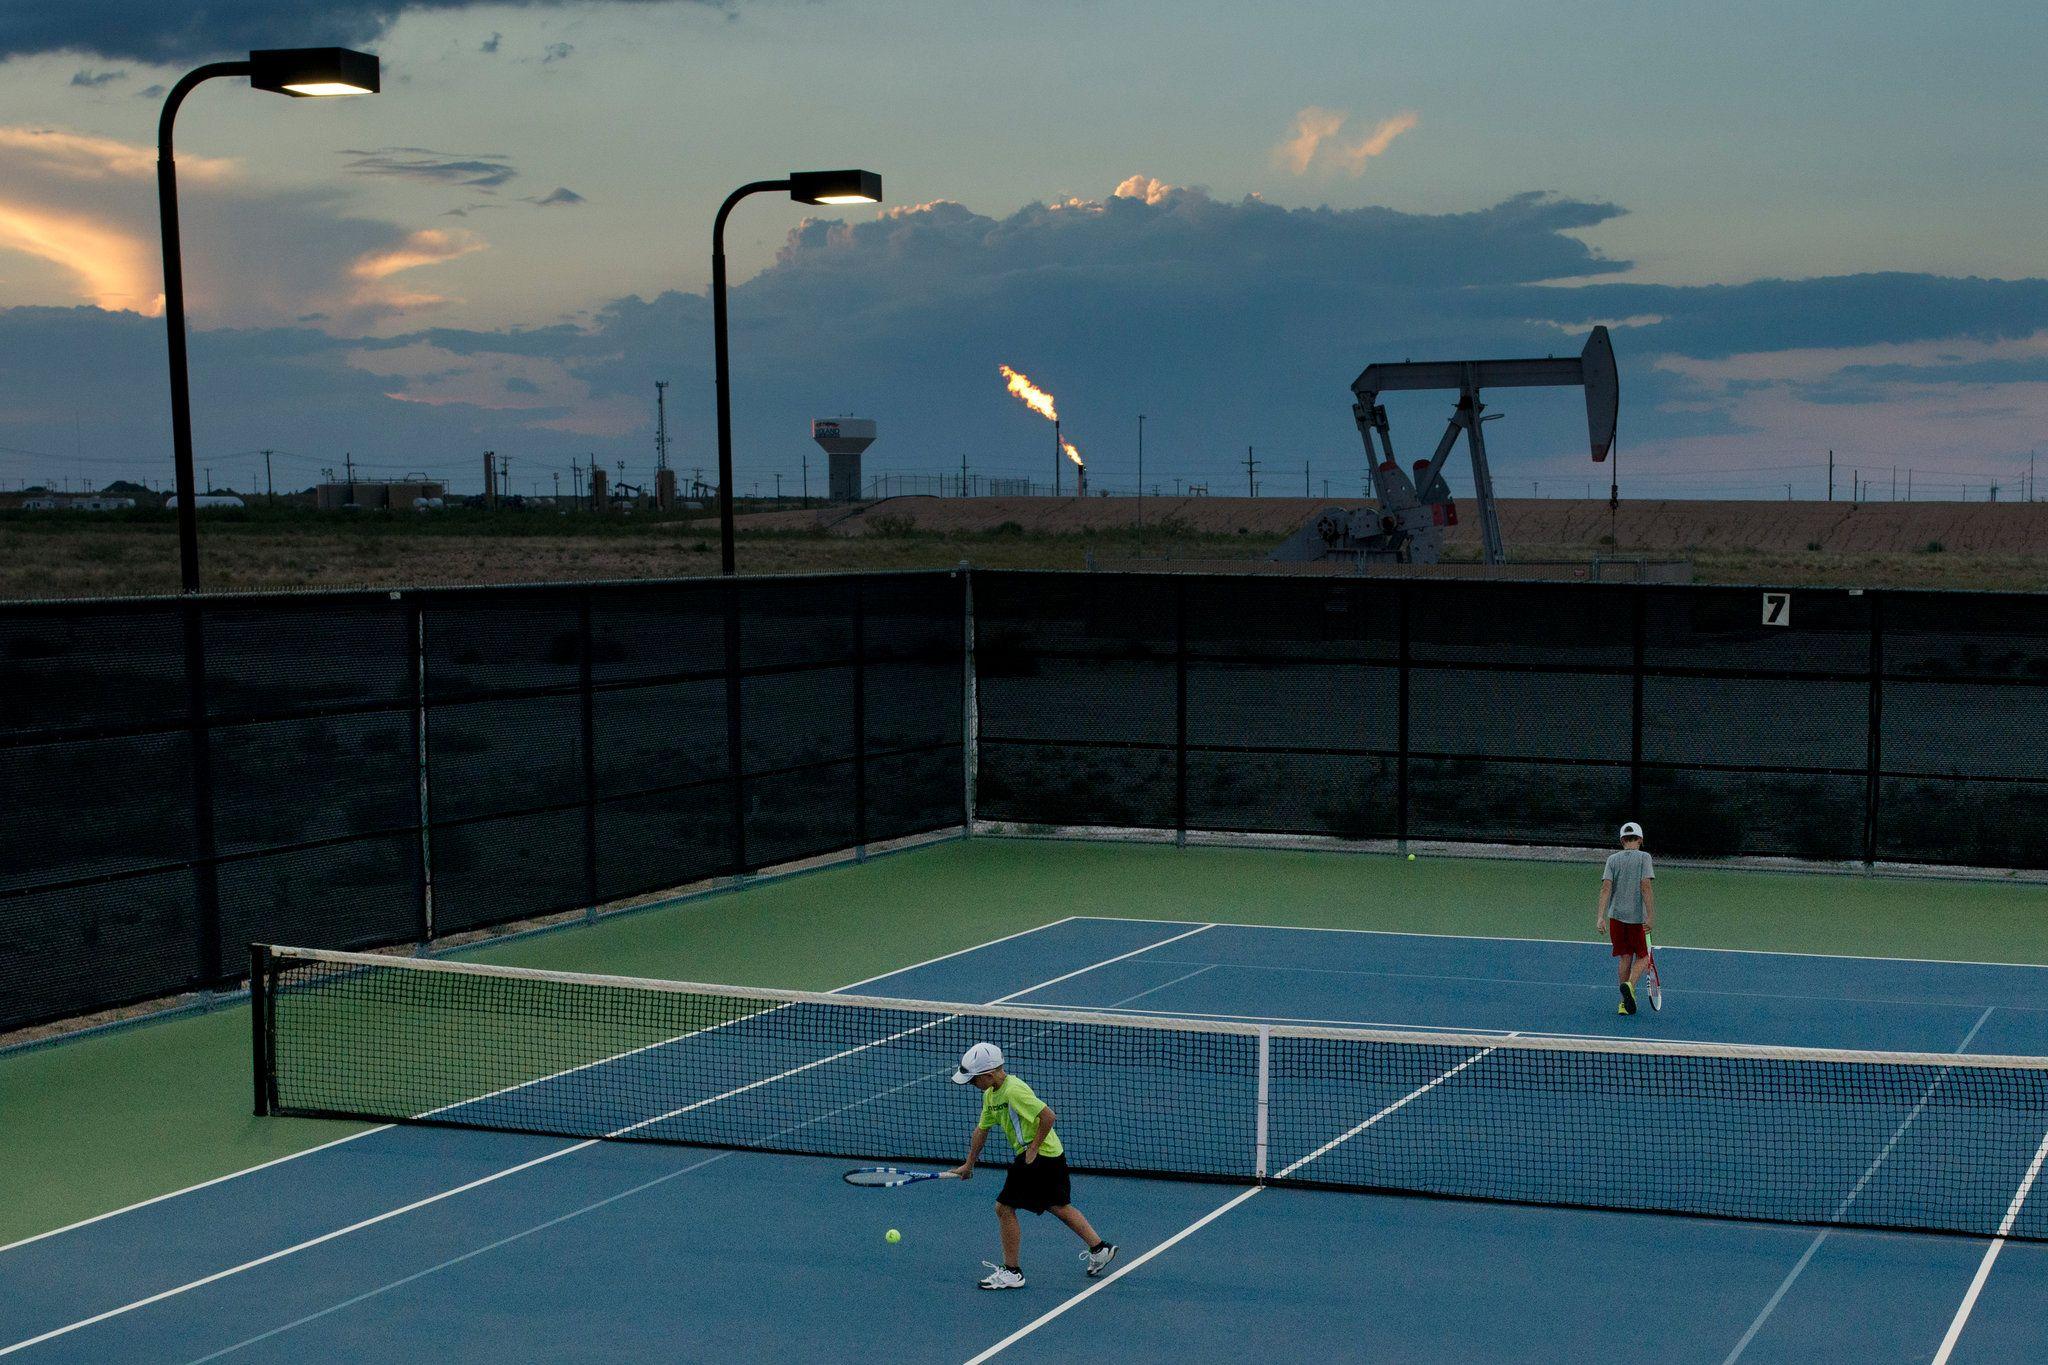 Tennis Anywhere Tennis Basketball Court Size Tennis Court